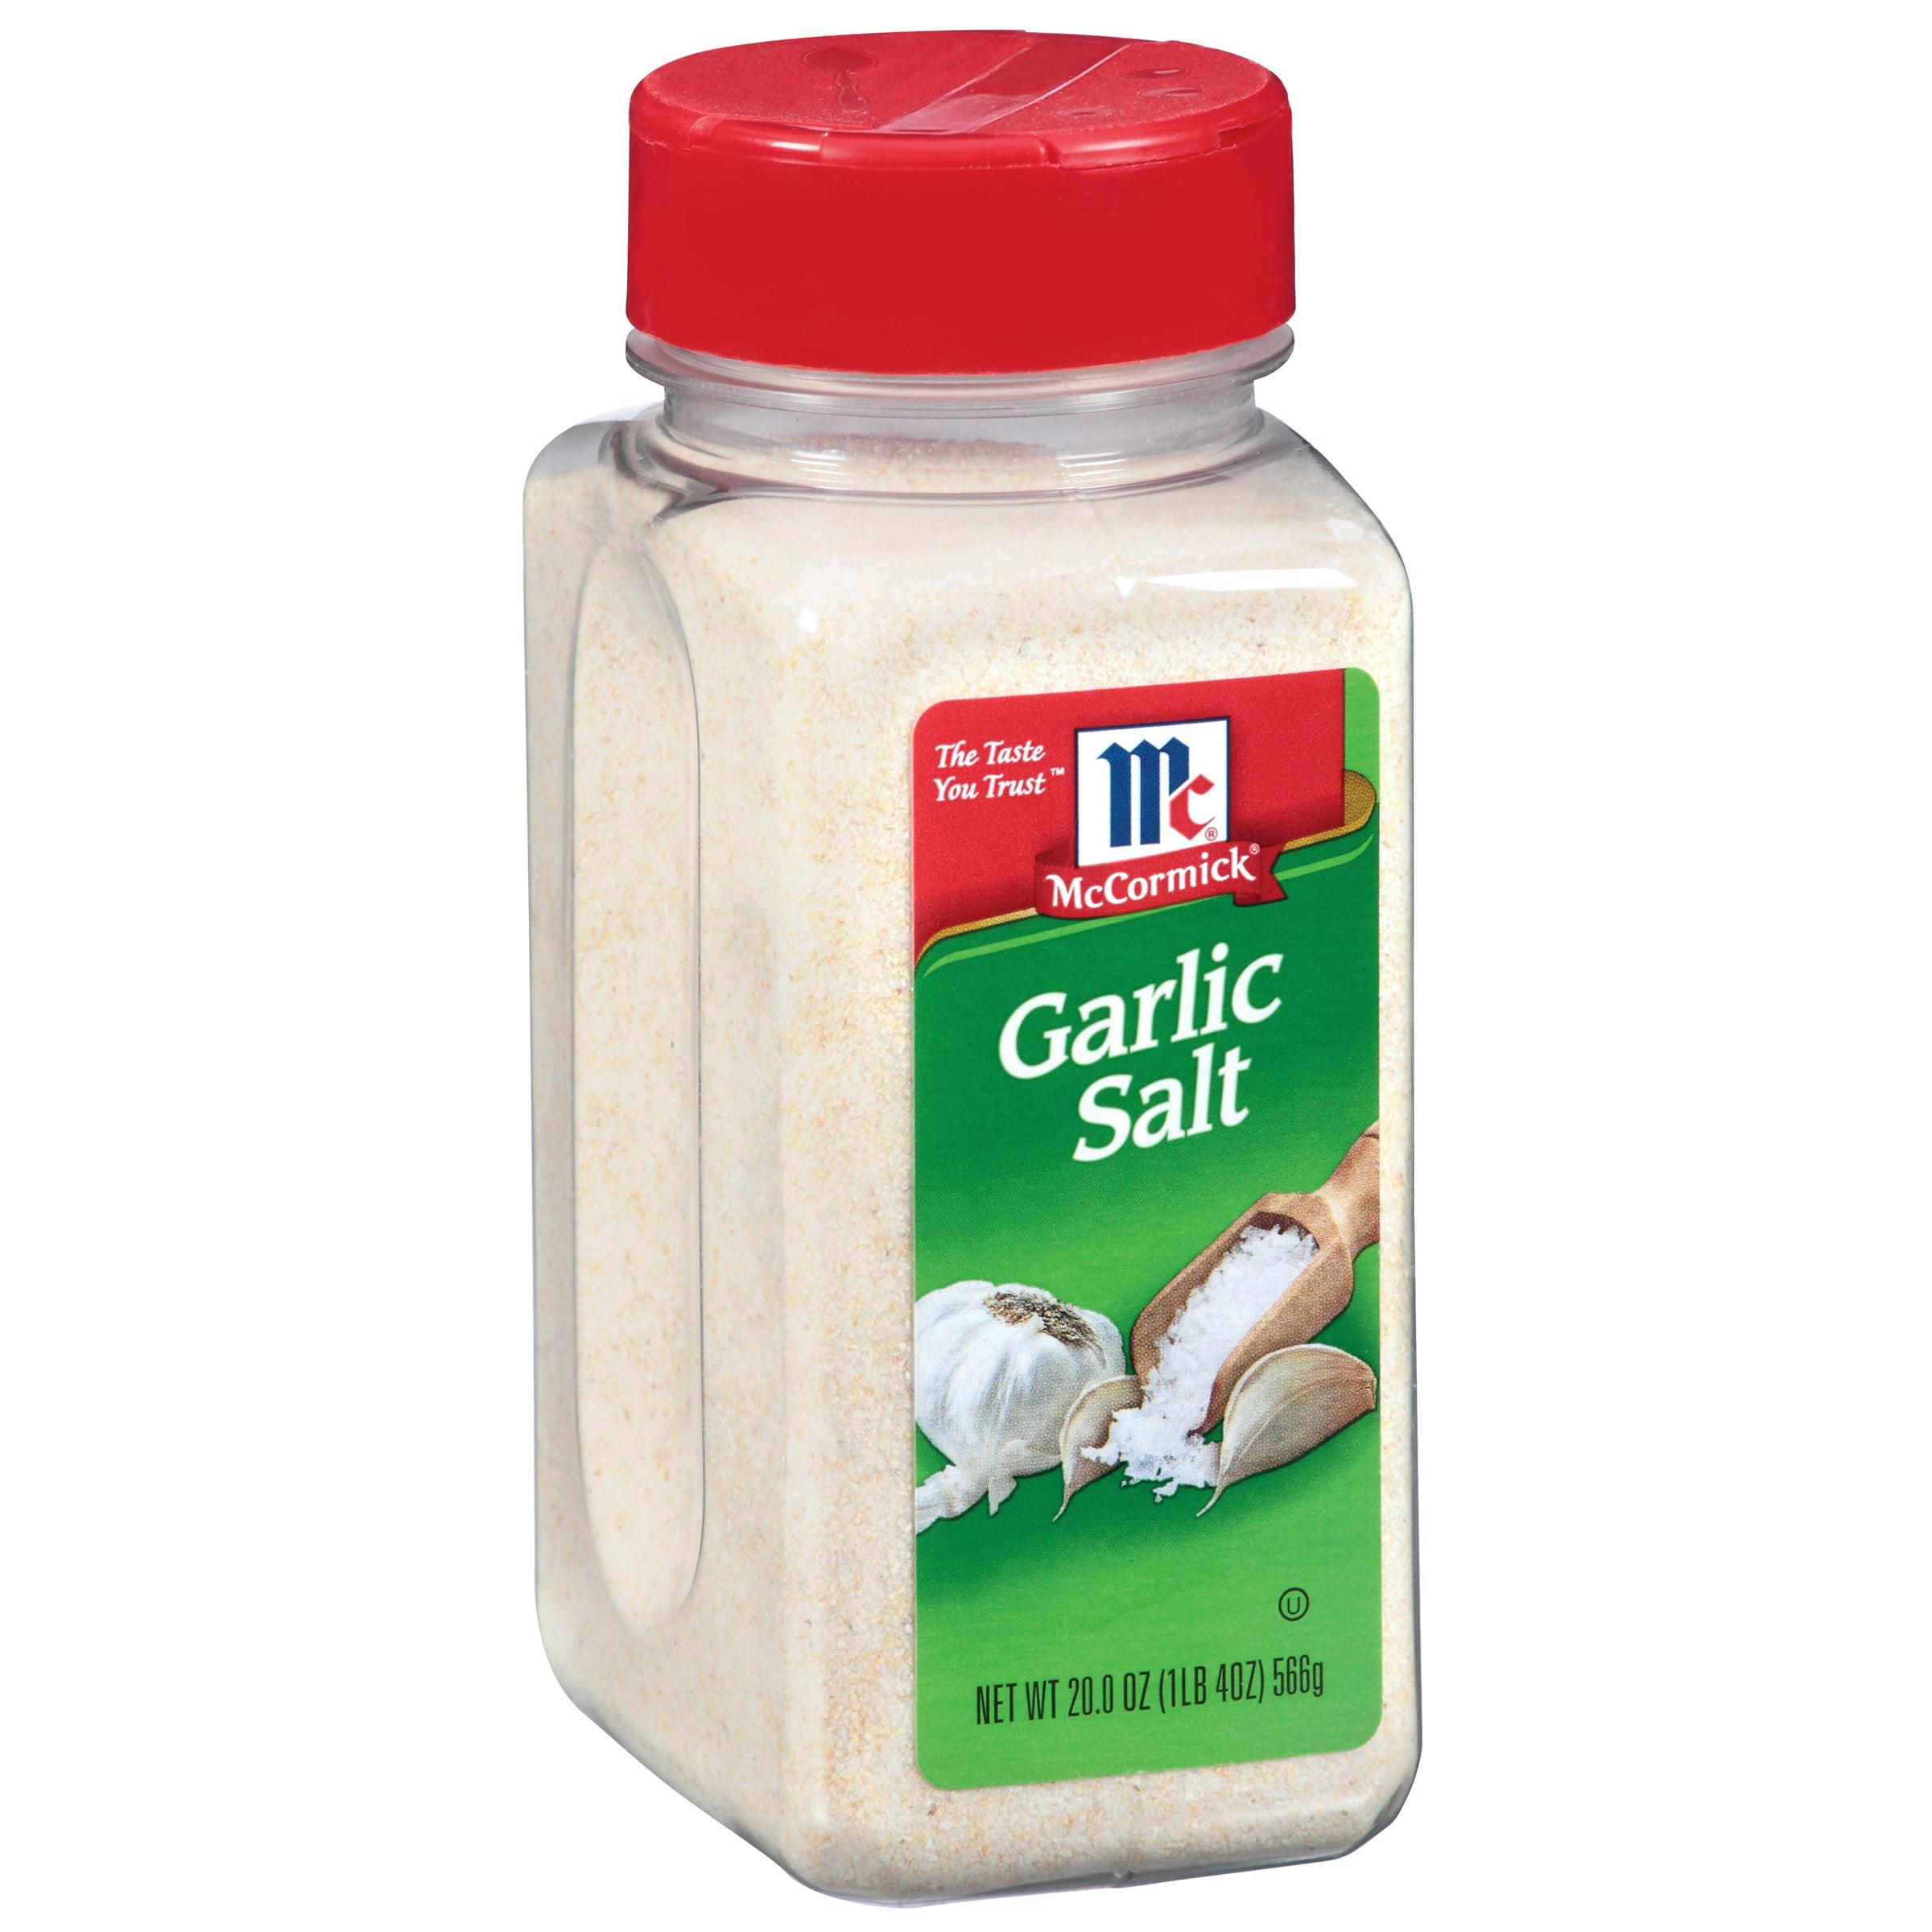 McCormick Garlic Salt, 20 oz by McCormick & Co., Inc.